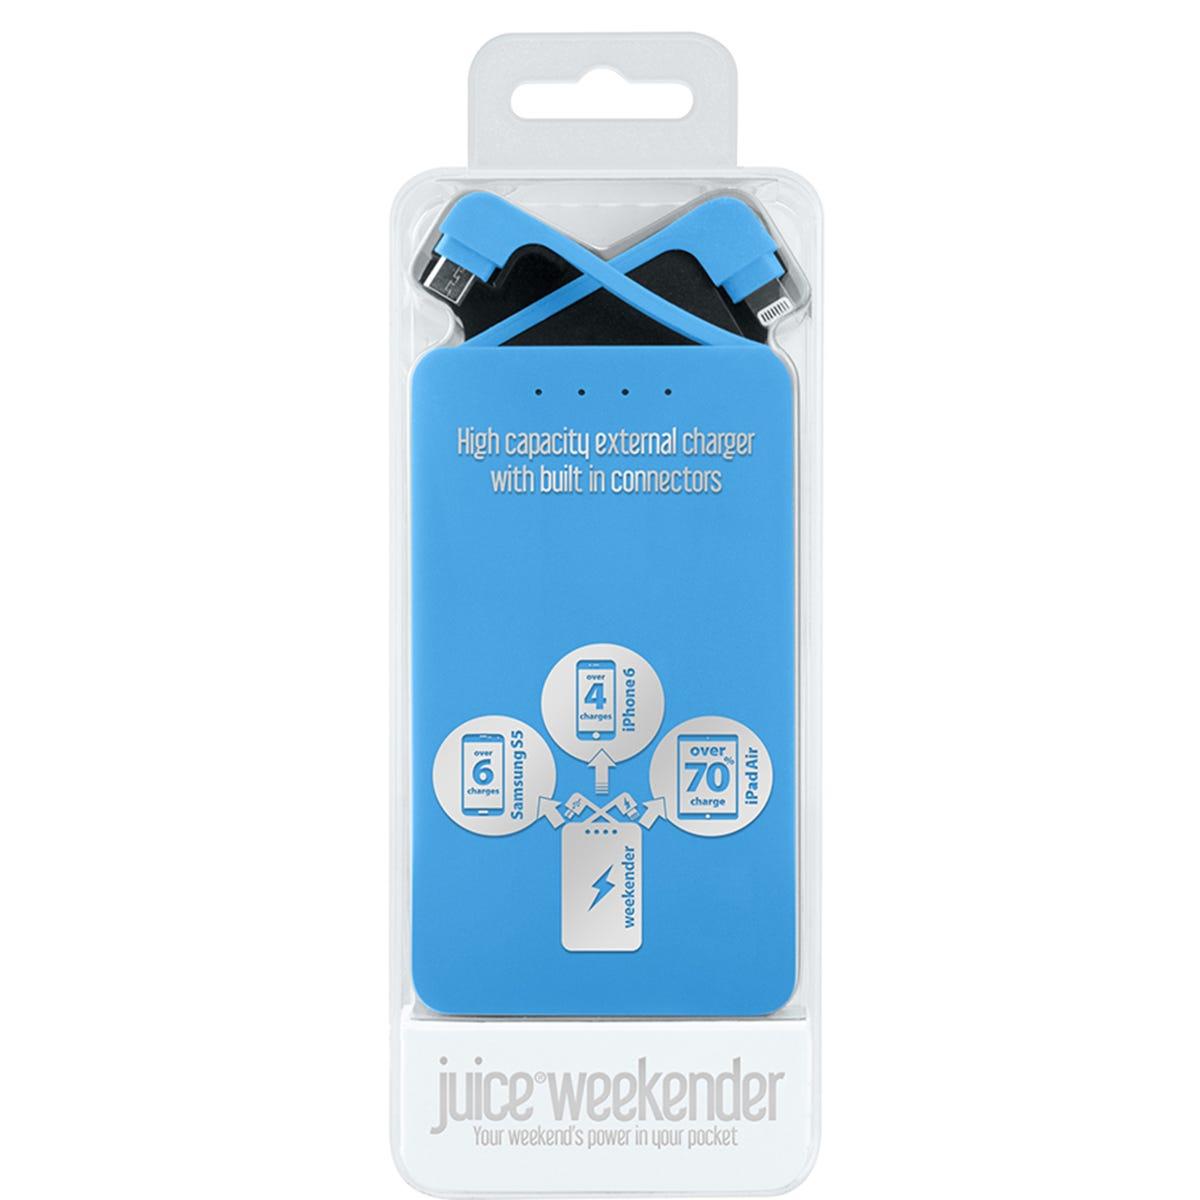 Image of     Juice Weekender 8,400mAh Power Bank - Aqua